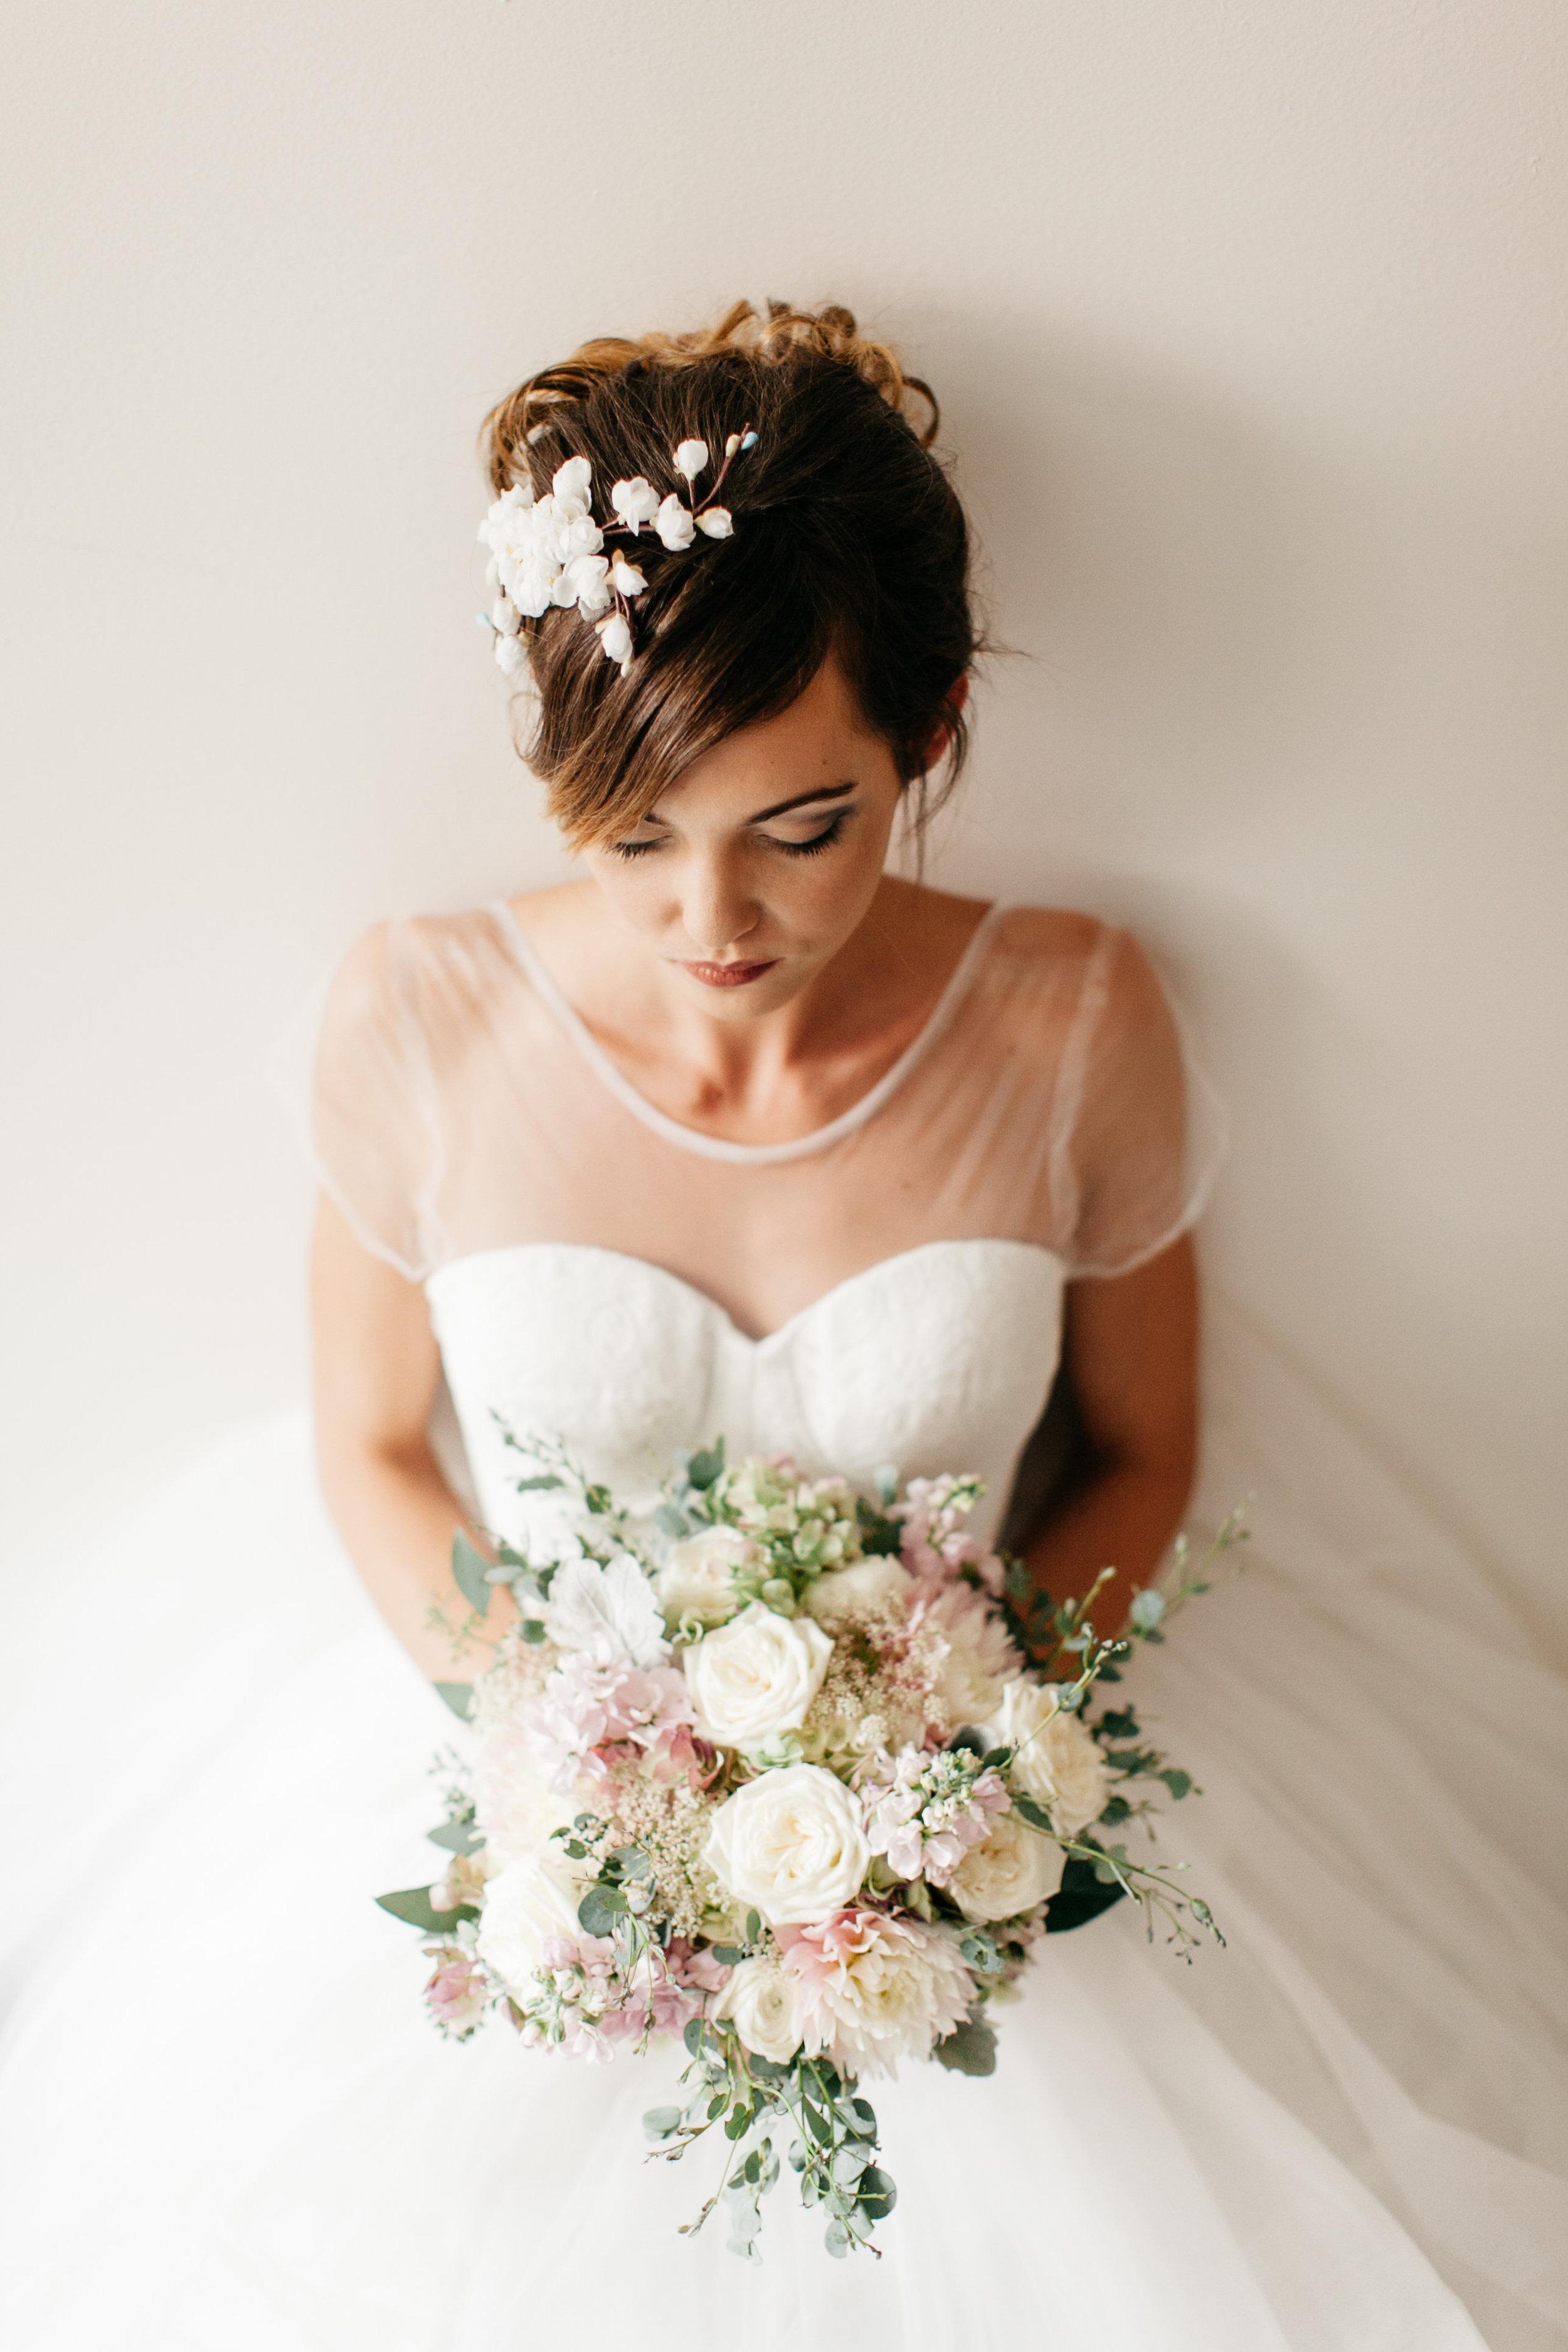 Styled Bridal Shoot-Styled Bridal Shoot-0200.jpg